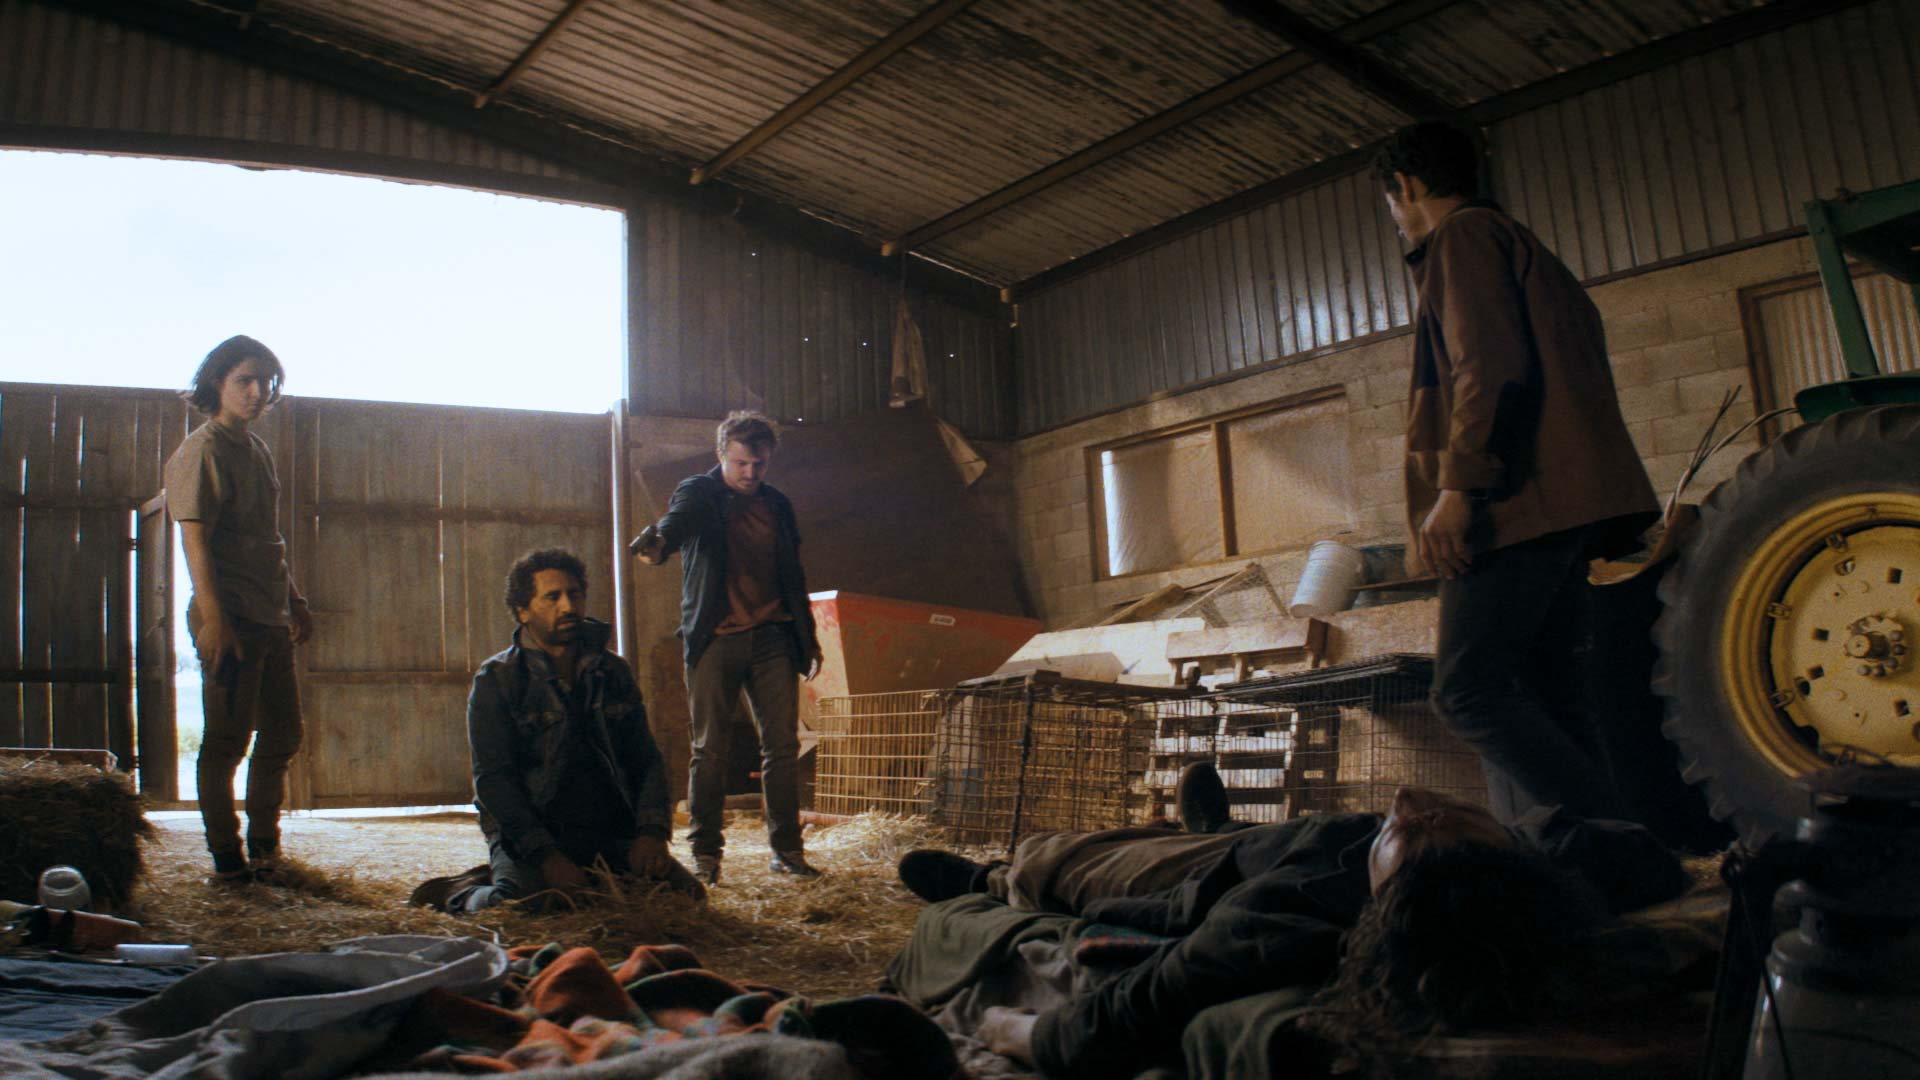 (SPOILERS) Talked About Scene from Fear the Walking Dead Episode 213